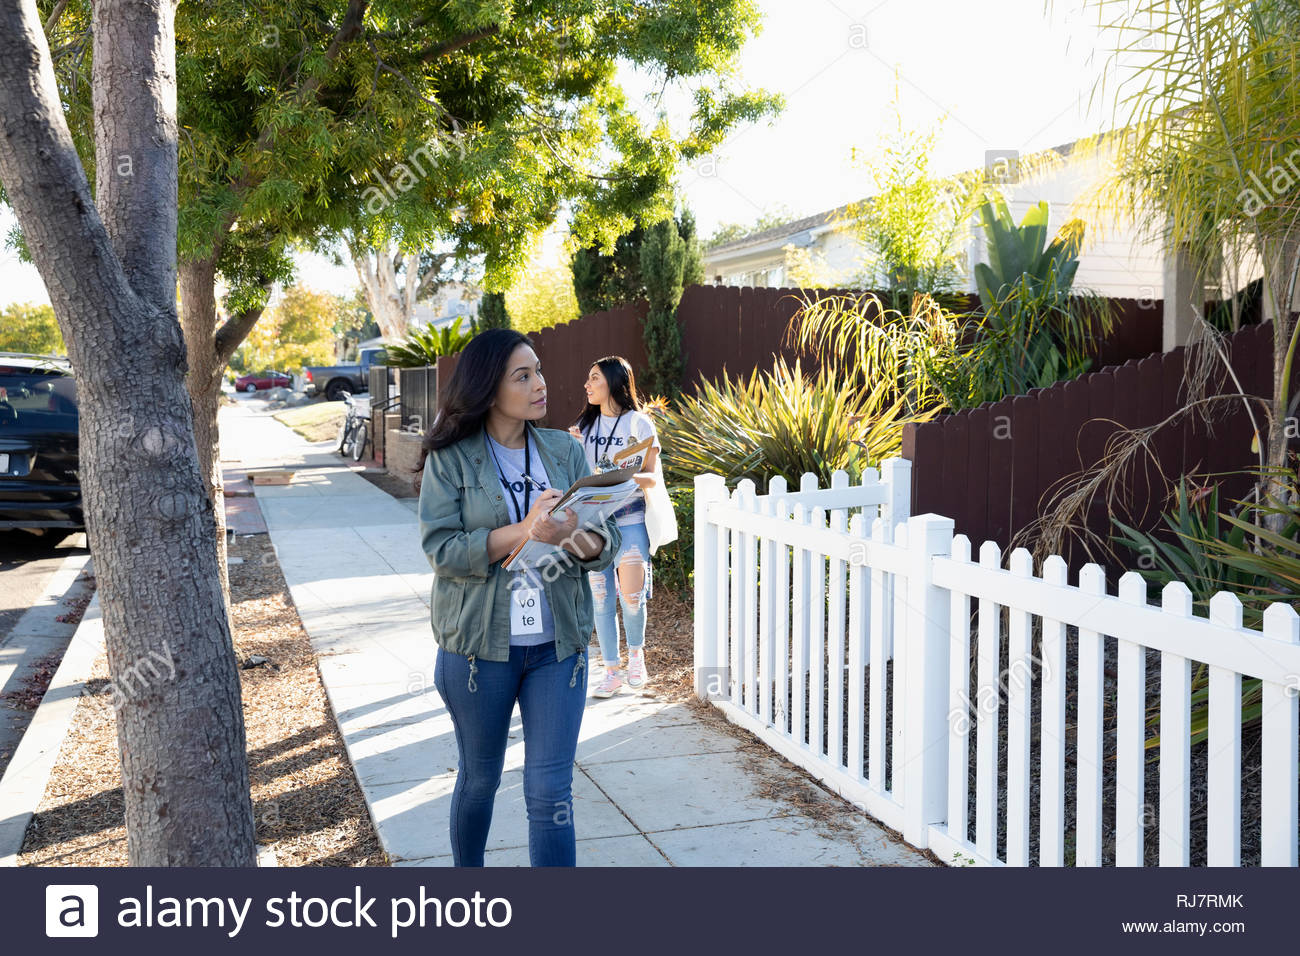 Latinx female volunteers canvassing voters in neighborhood - Stock Image